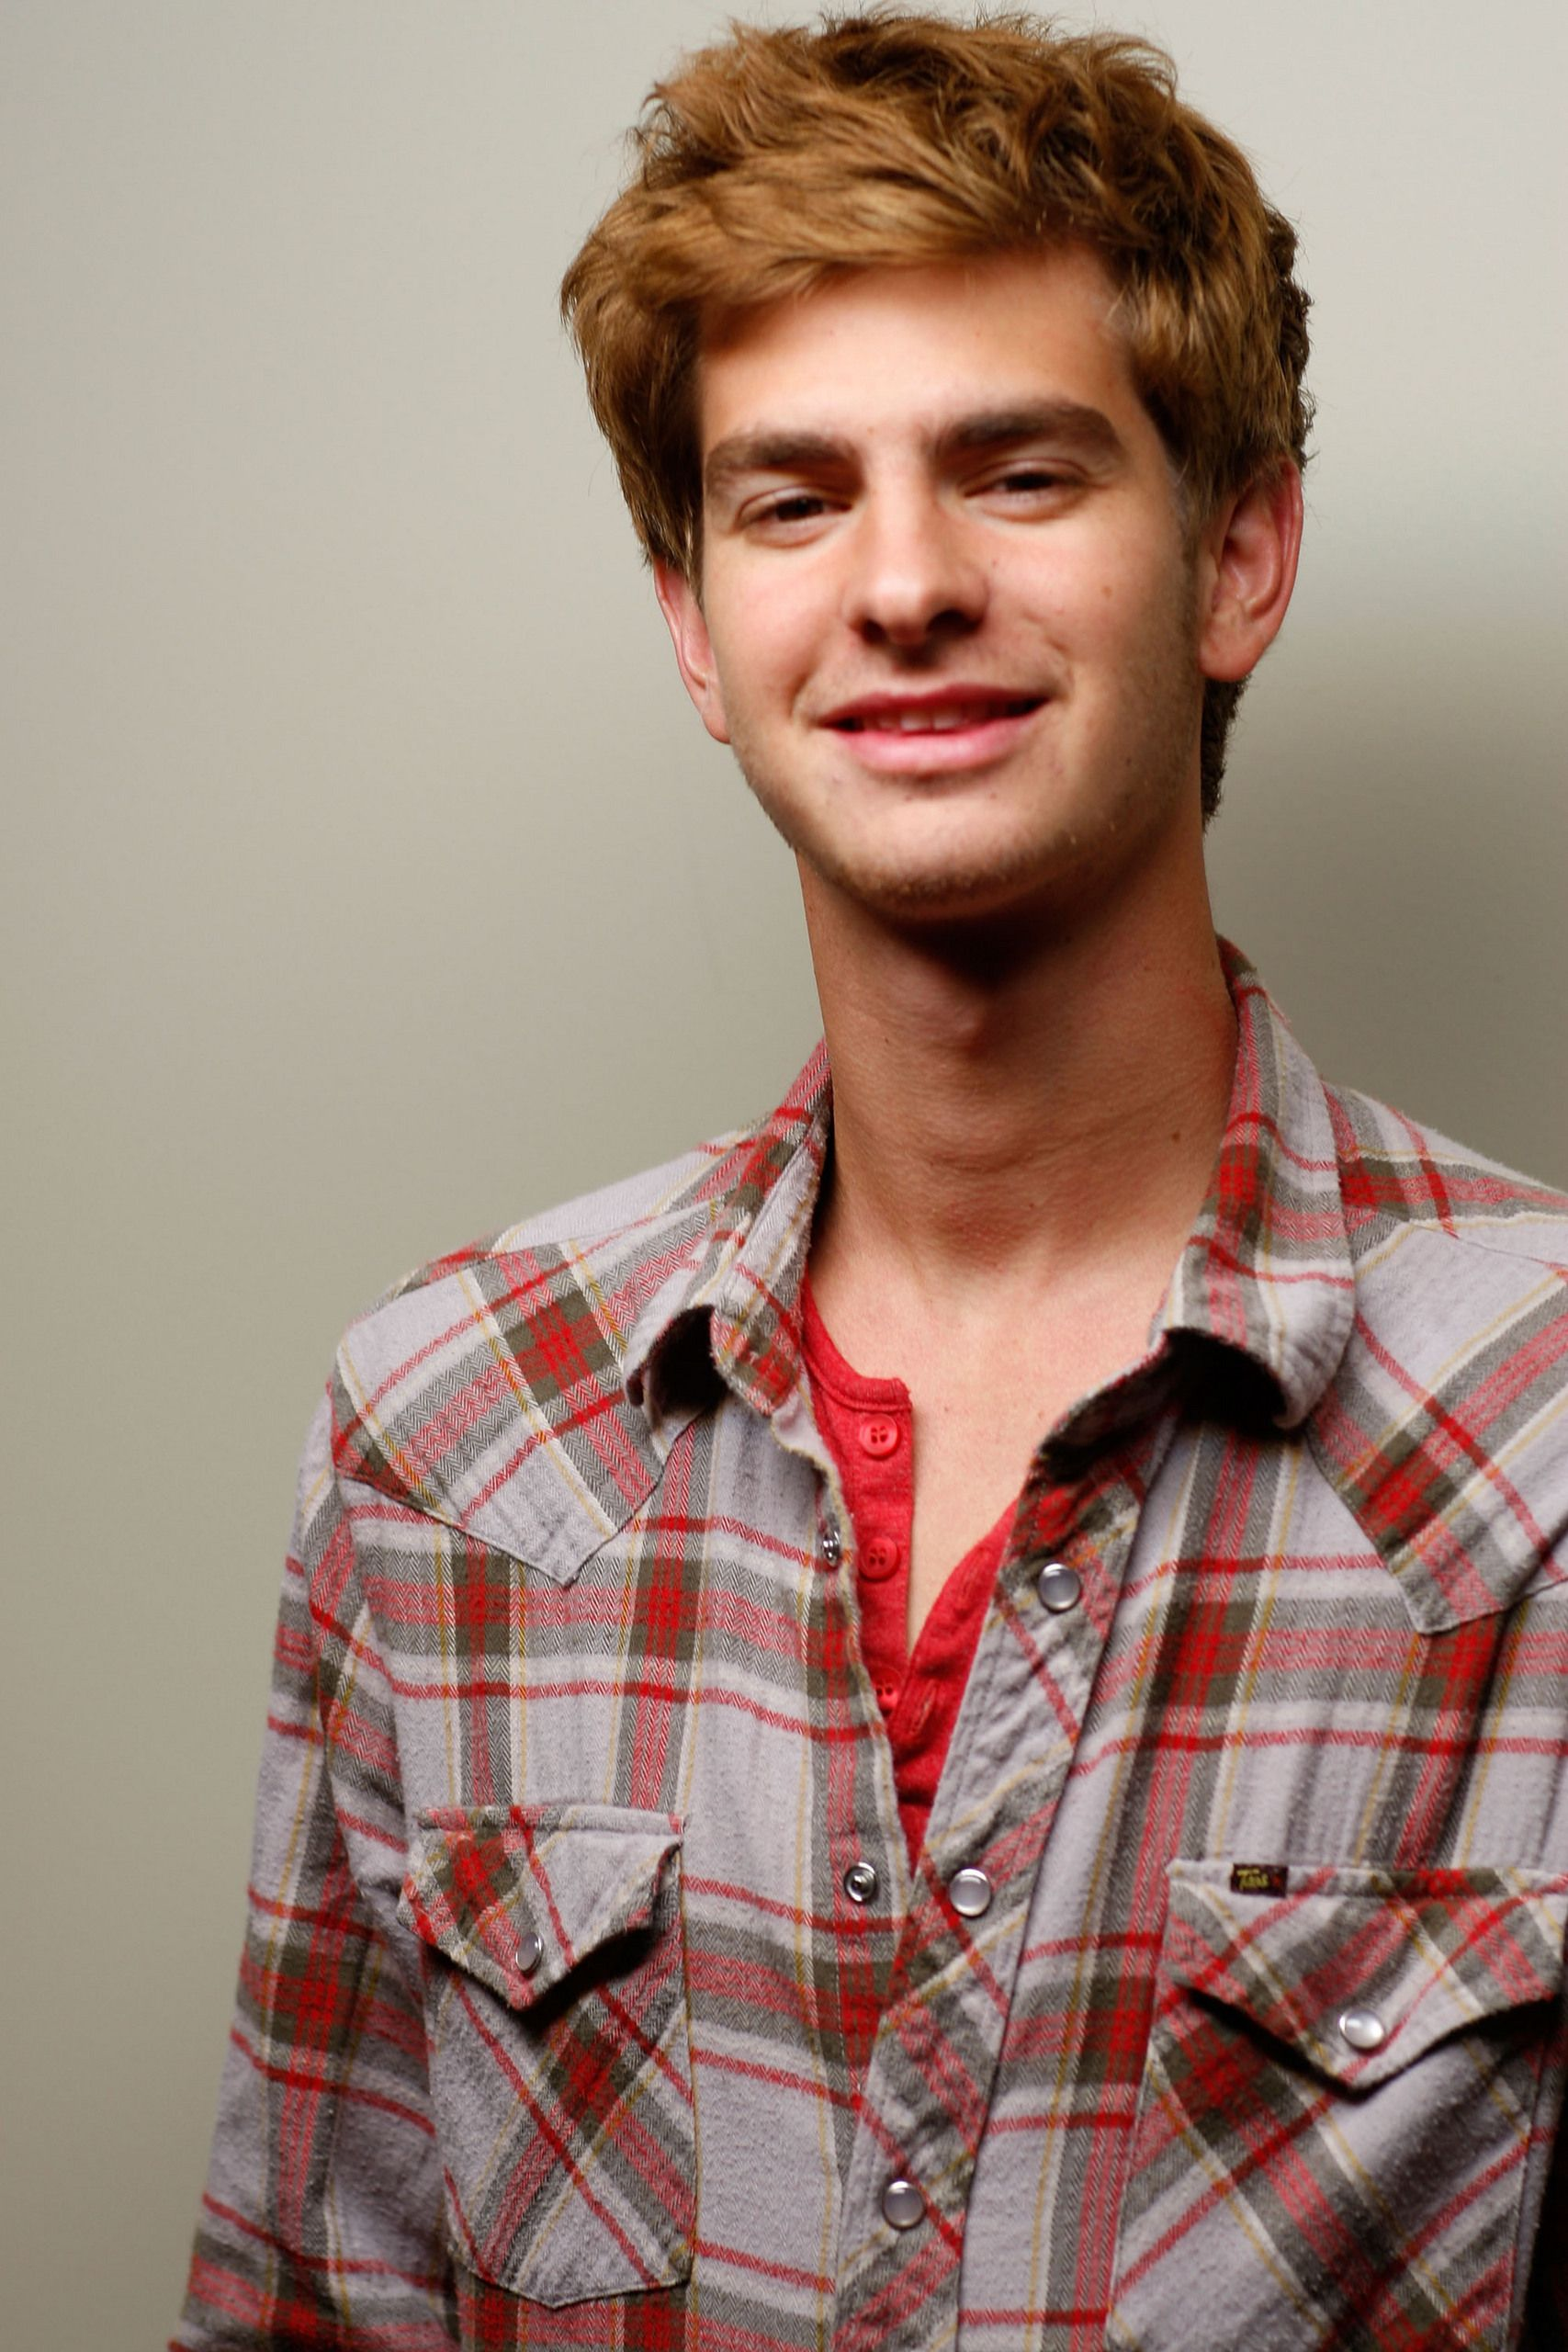 """Boy A"" Portrait Shoot - Andrew Garfield | Top 10 Favorite ... Andrew Garfield"